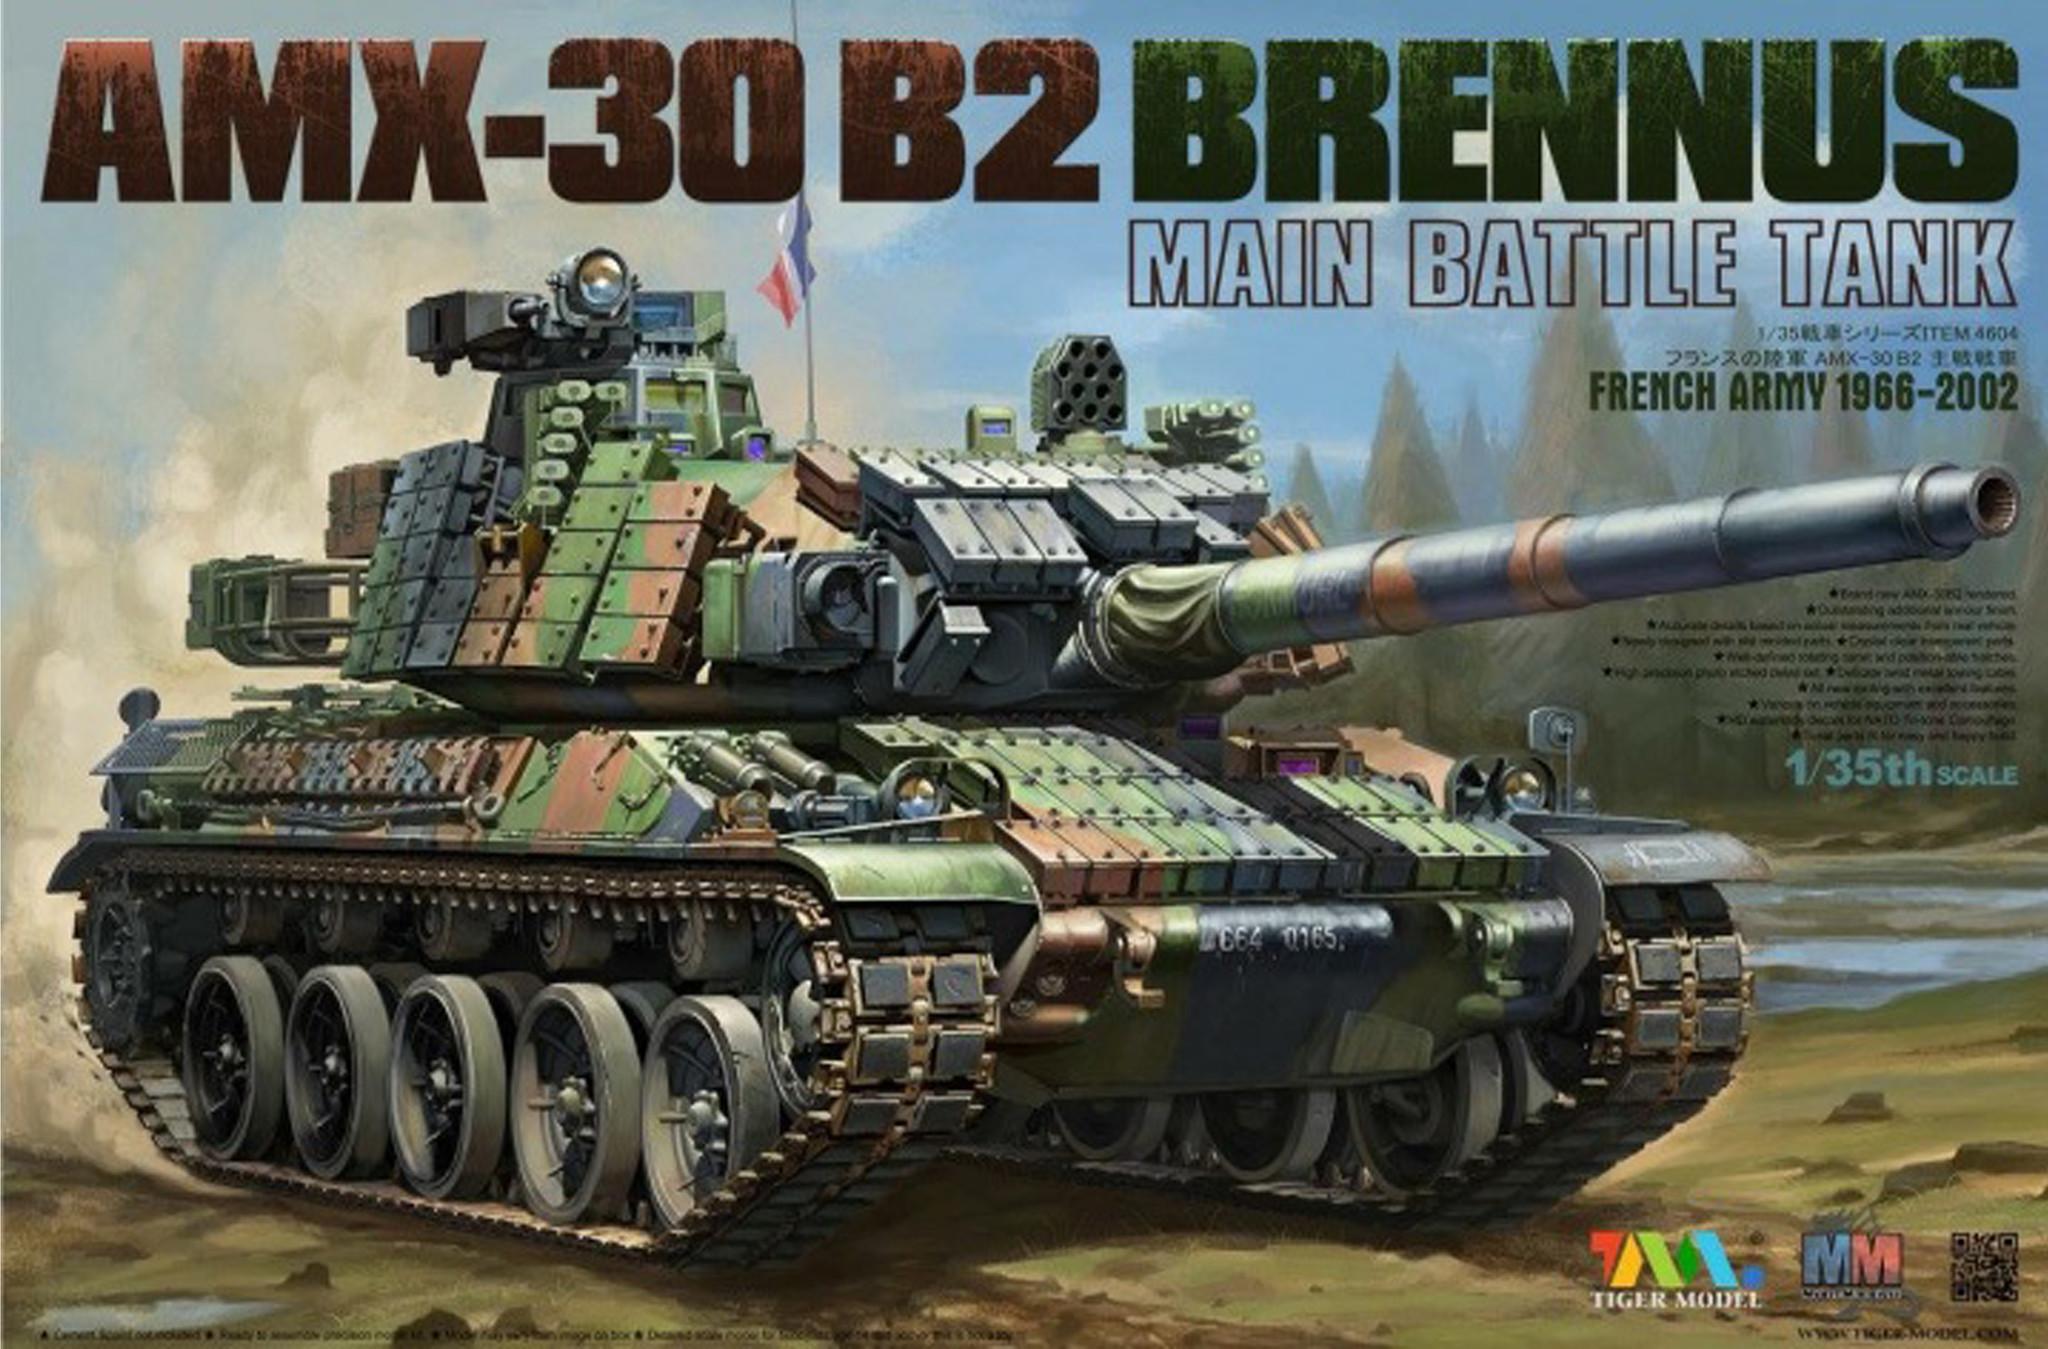 Tiger Model Amx-30B2 Brennus - Tiger Model - Scale 1/35 - TIGE4604